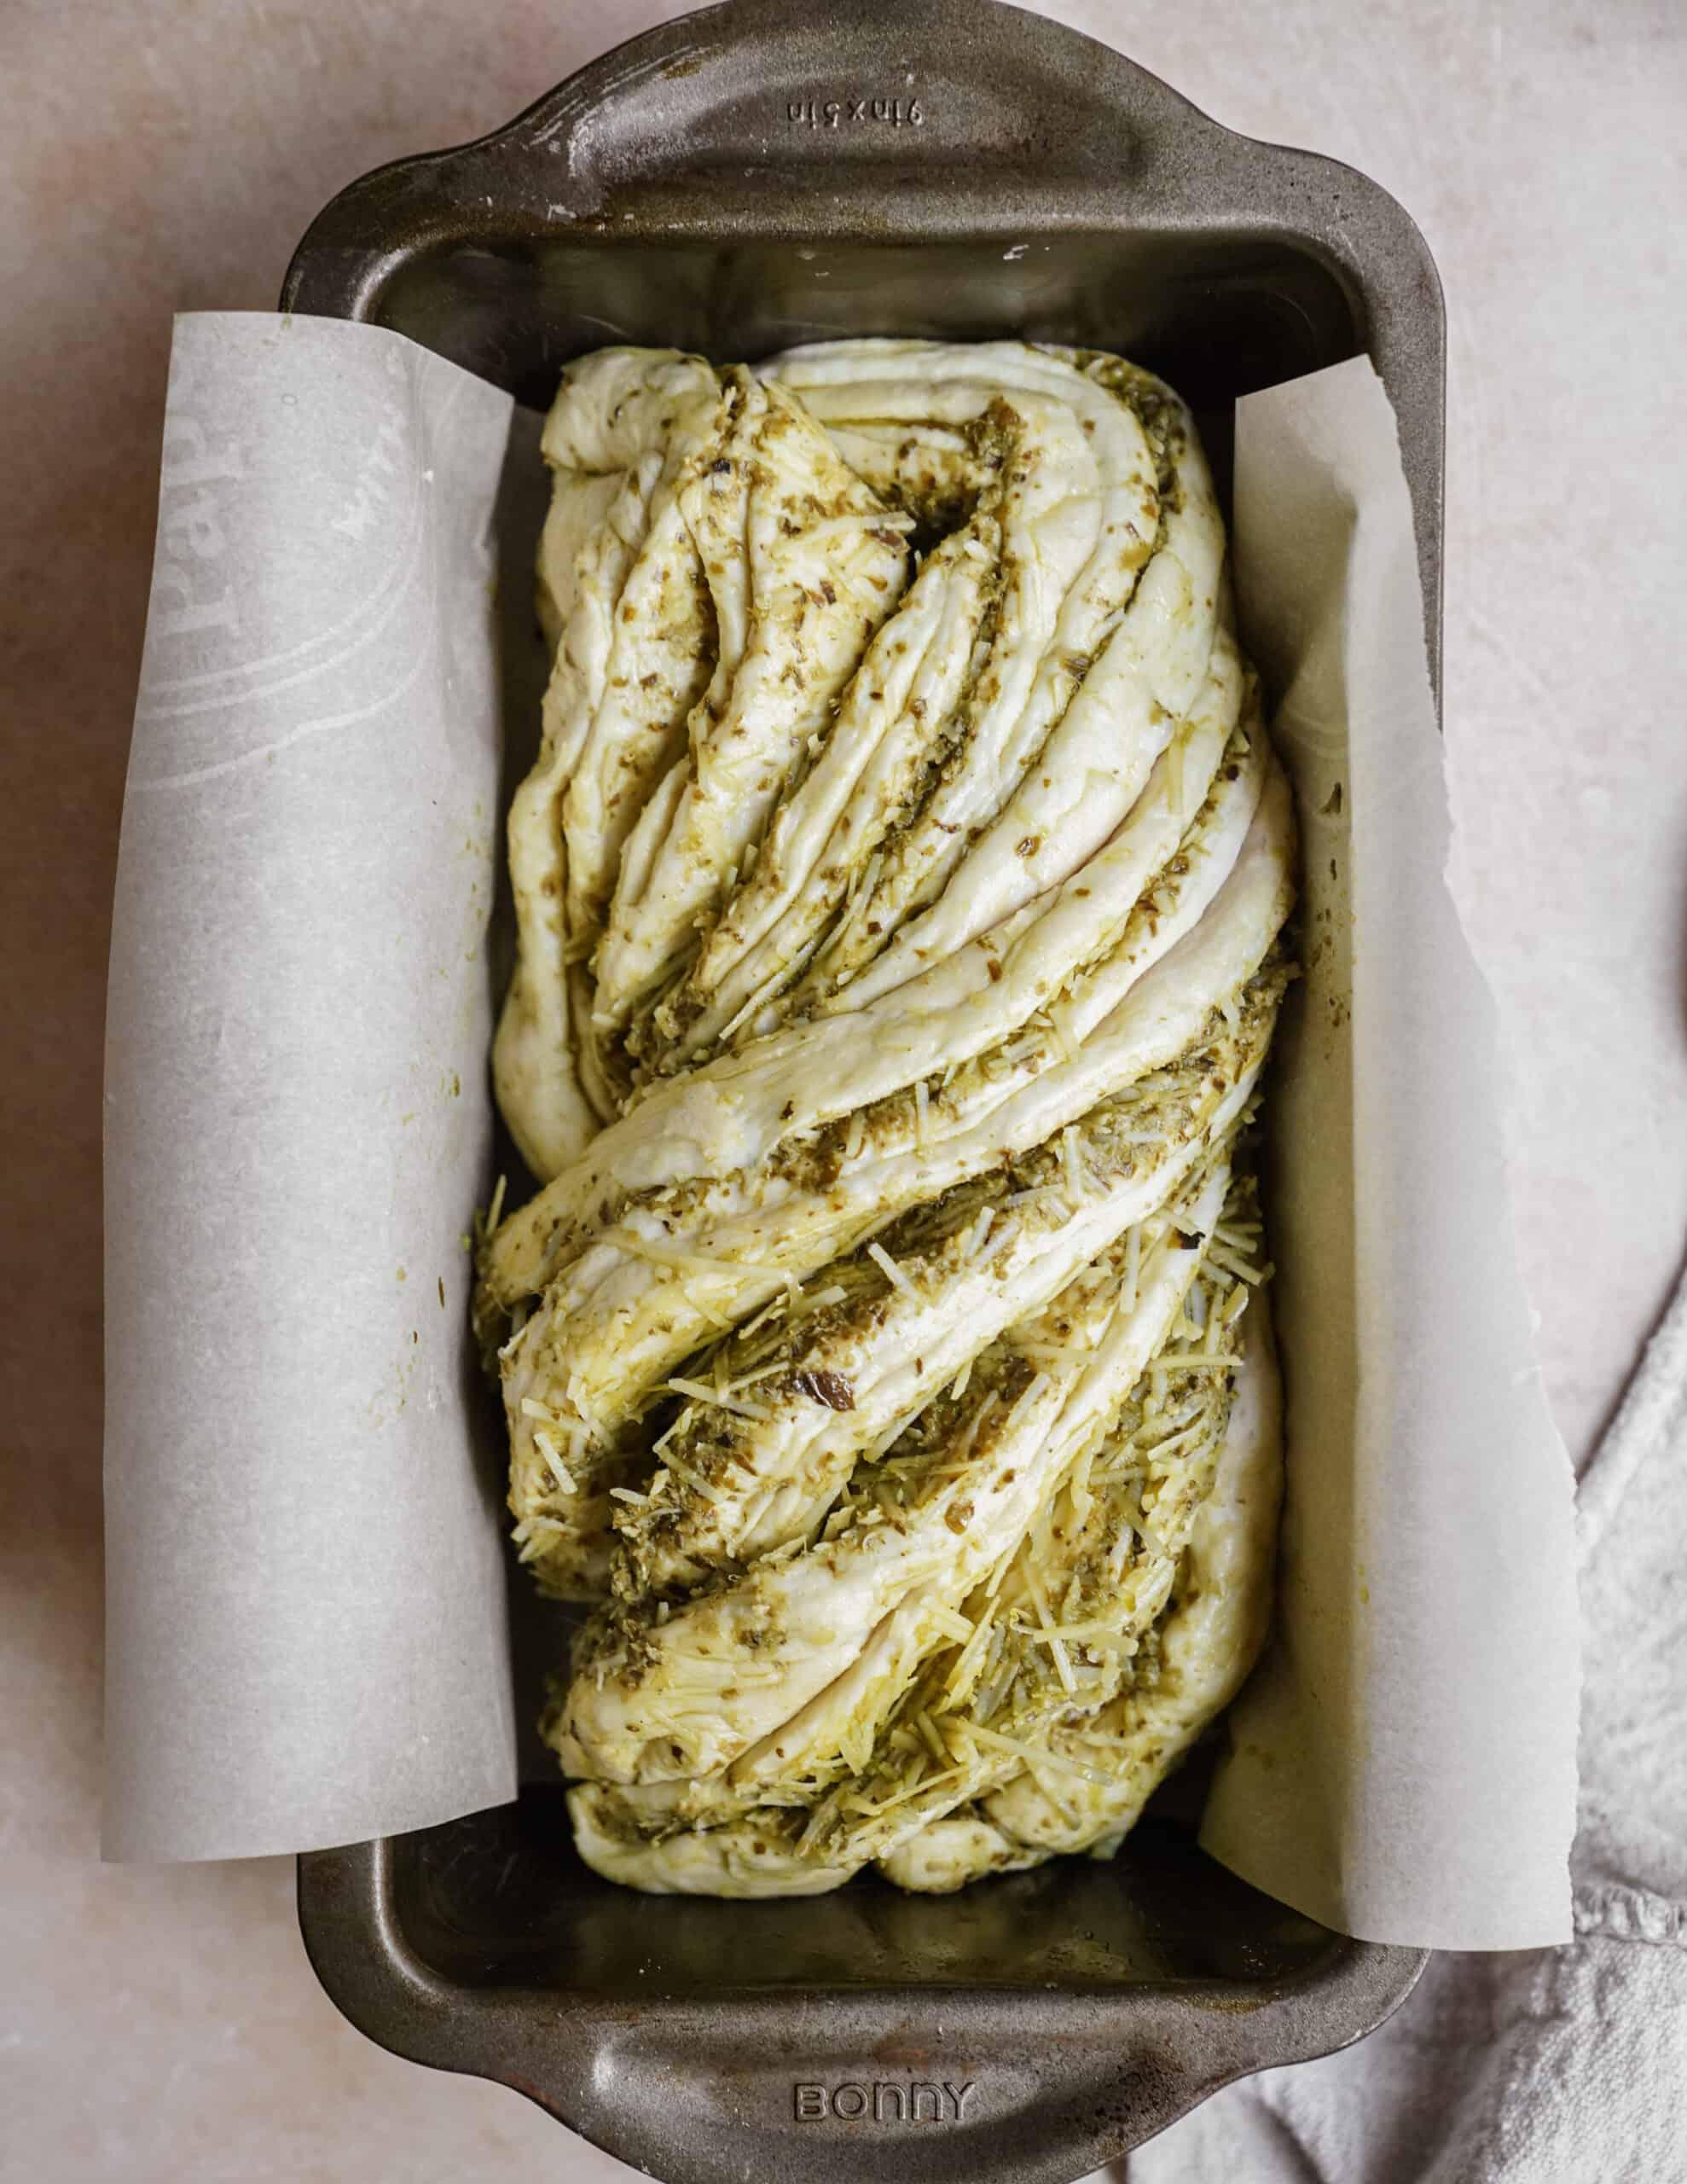 Twist bread in a pan ready to bake